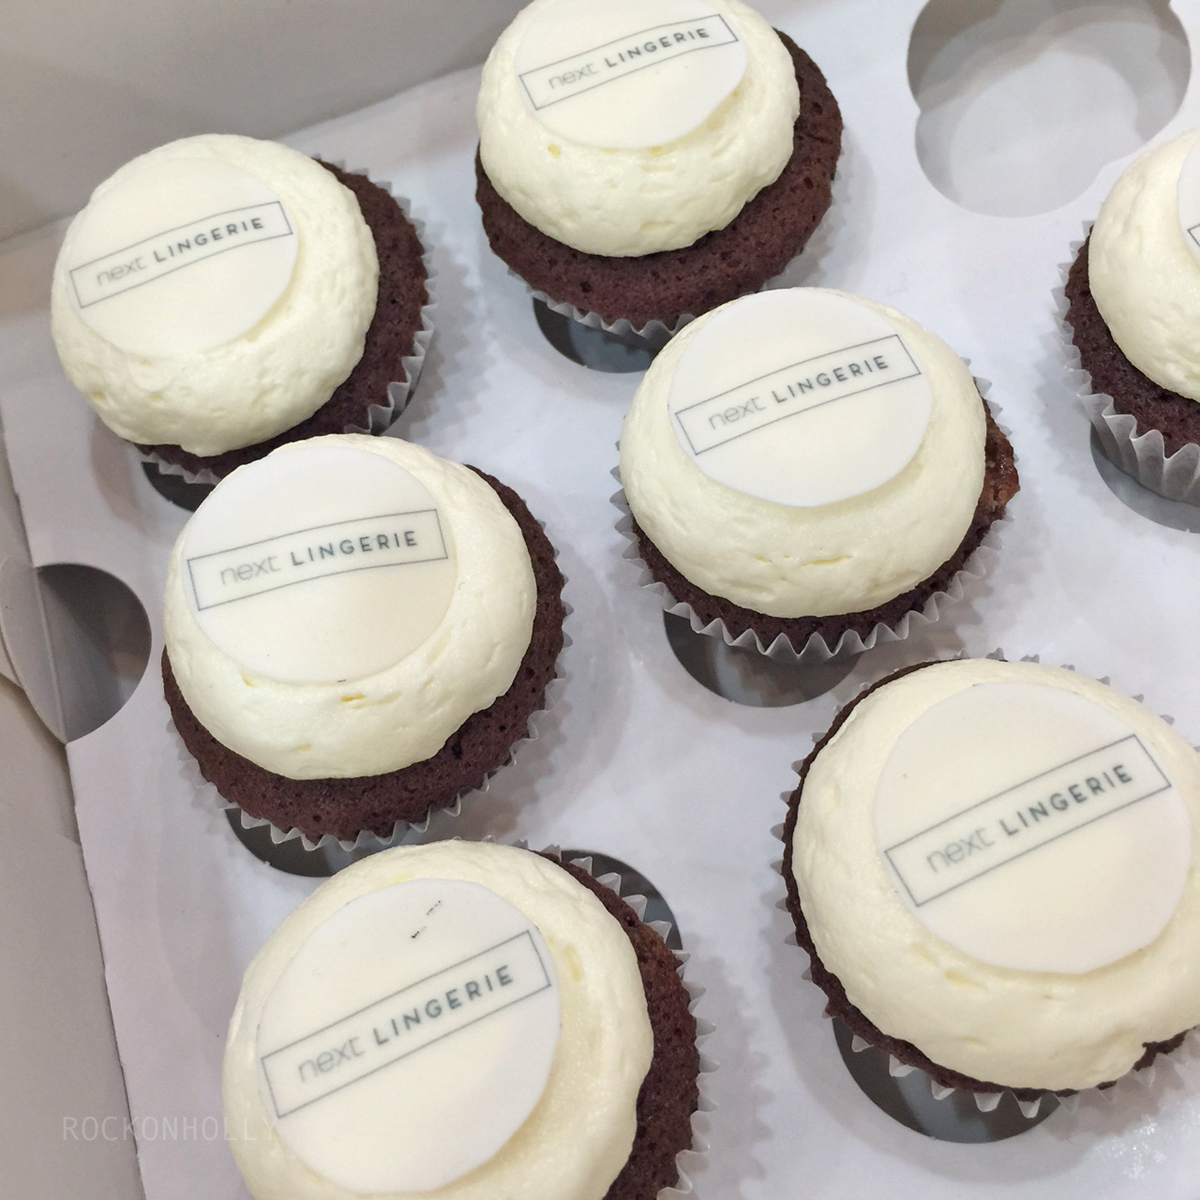 Next Lingerie Event - cupcakes